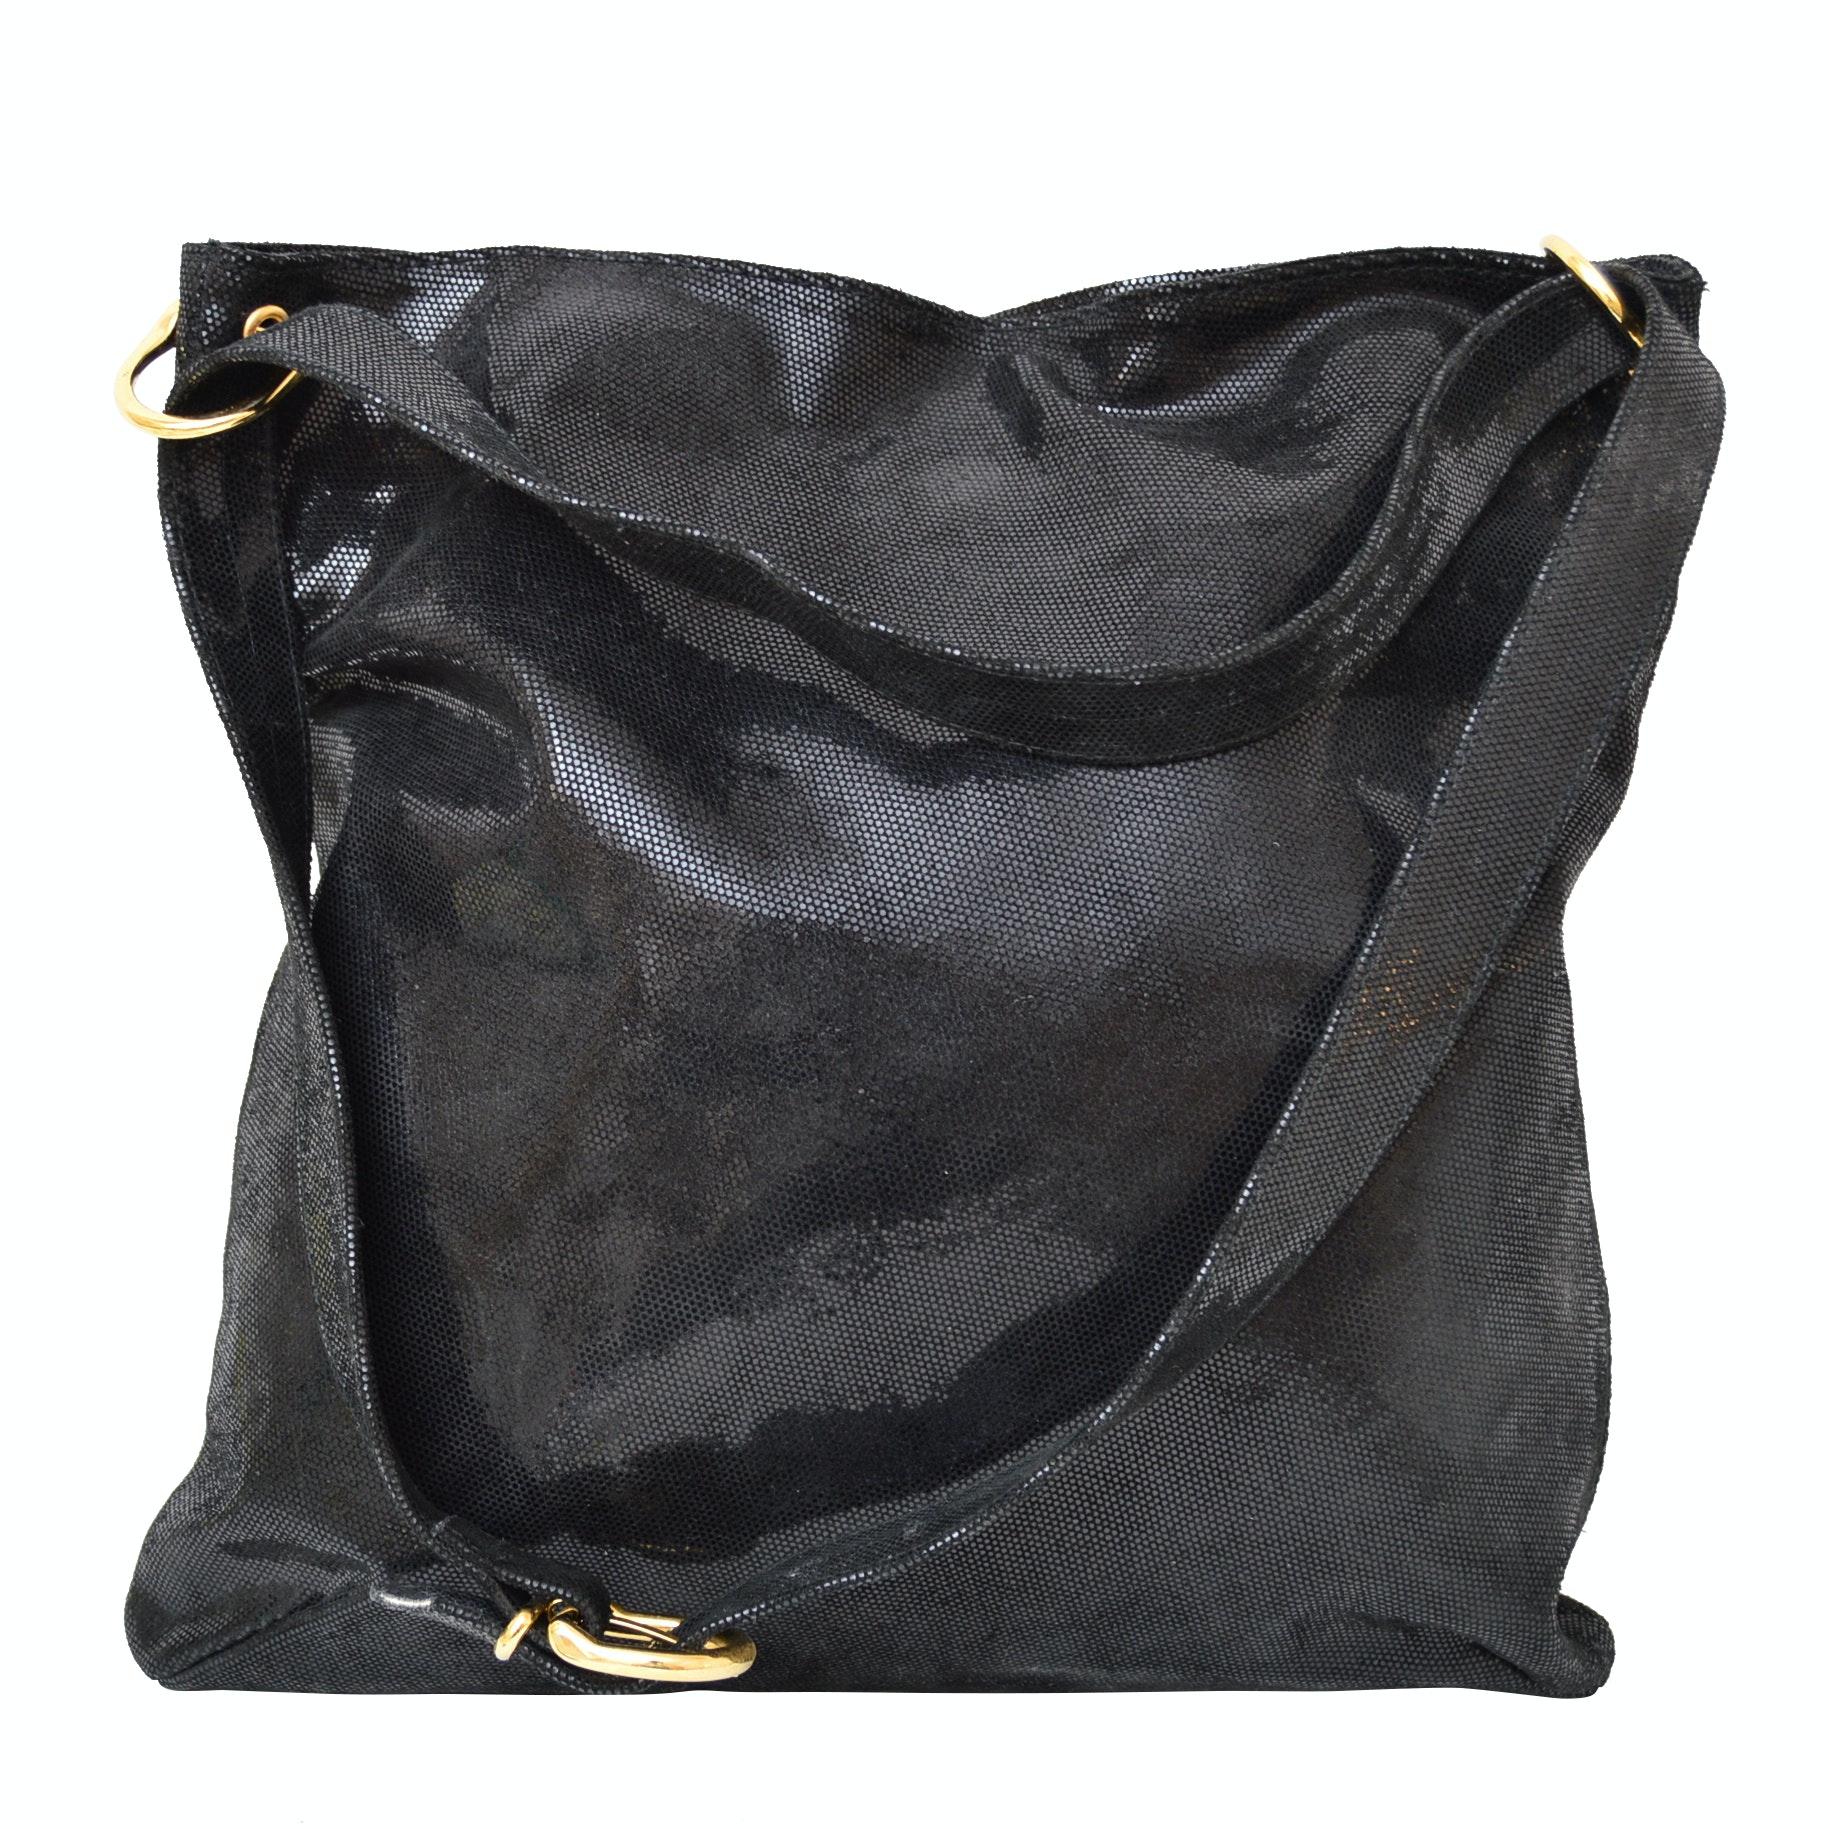 Ravasi Textured Patent Leather Tote